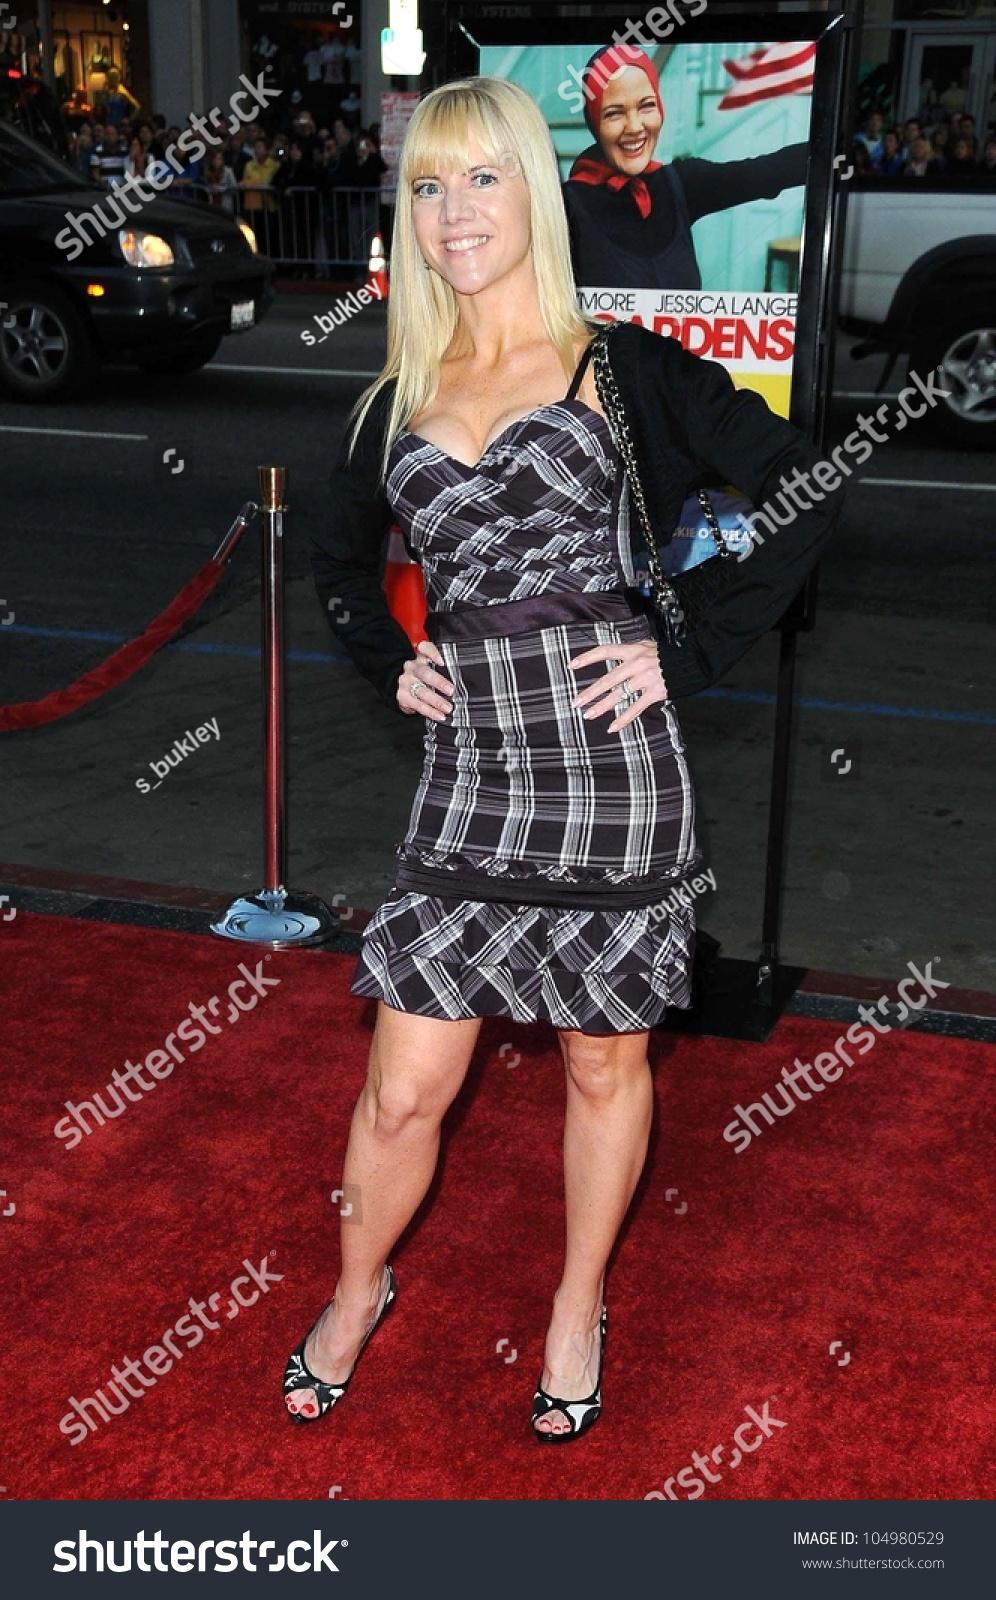 Patricia Arquette born April 8, 1968 (age 50),Geri Hoo Adult nude Miquel Brown,Roy Boyd (born 1938)